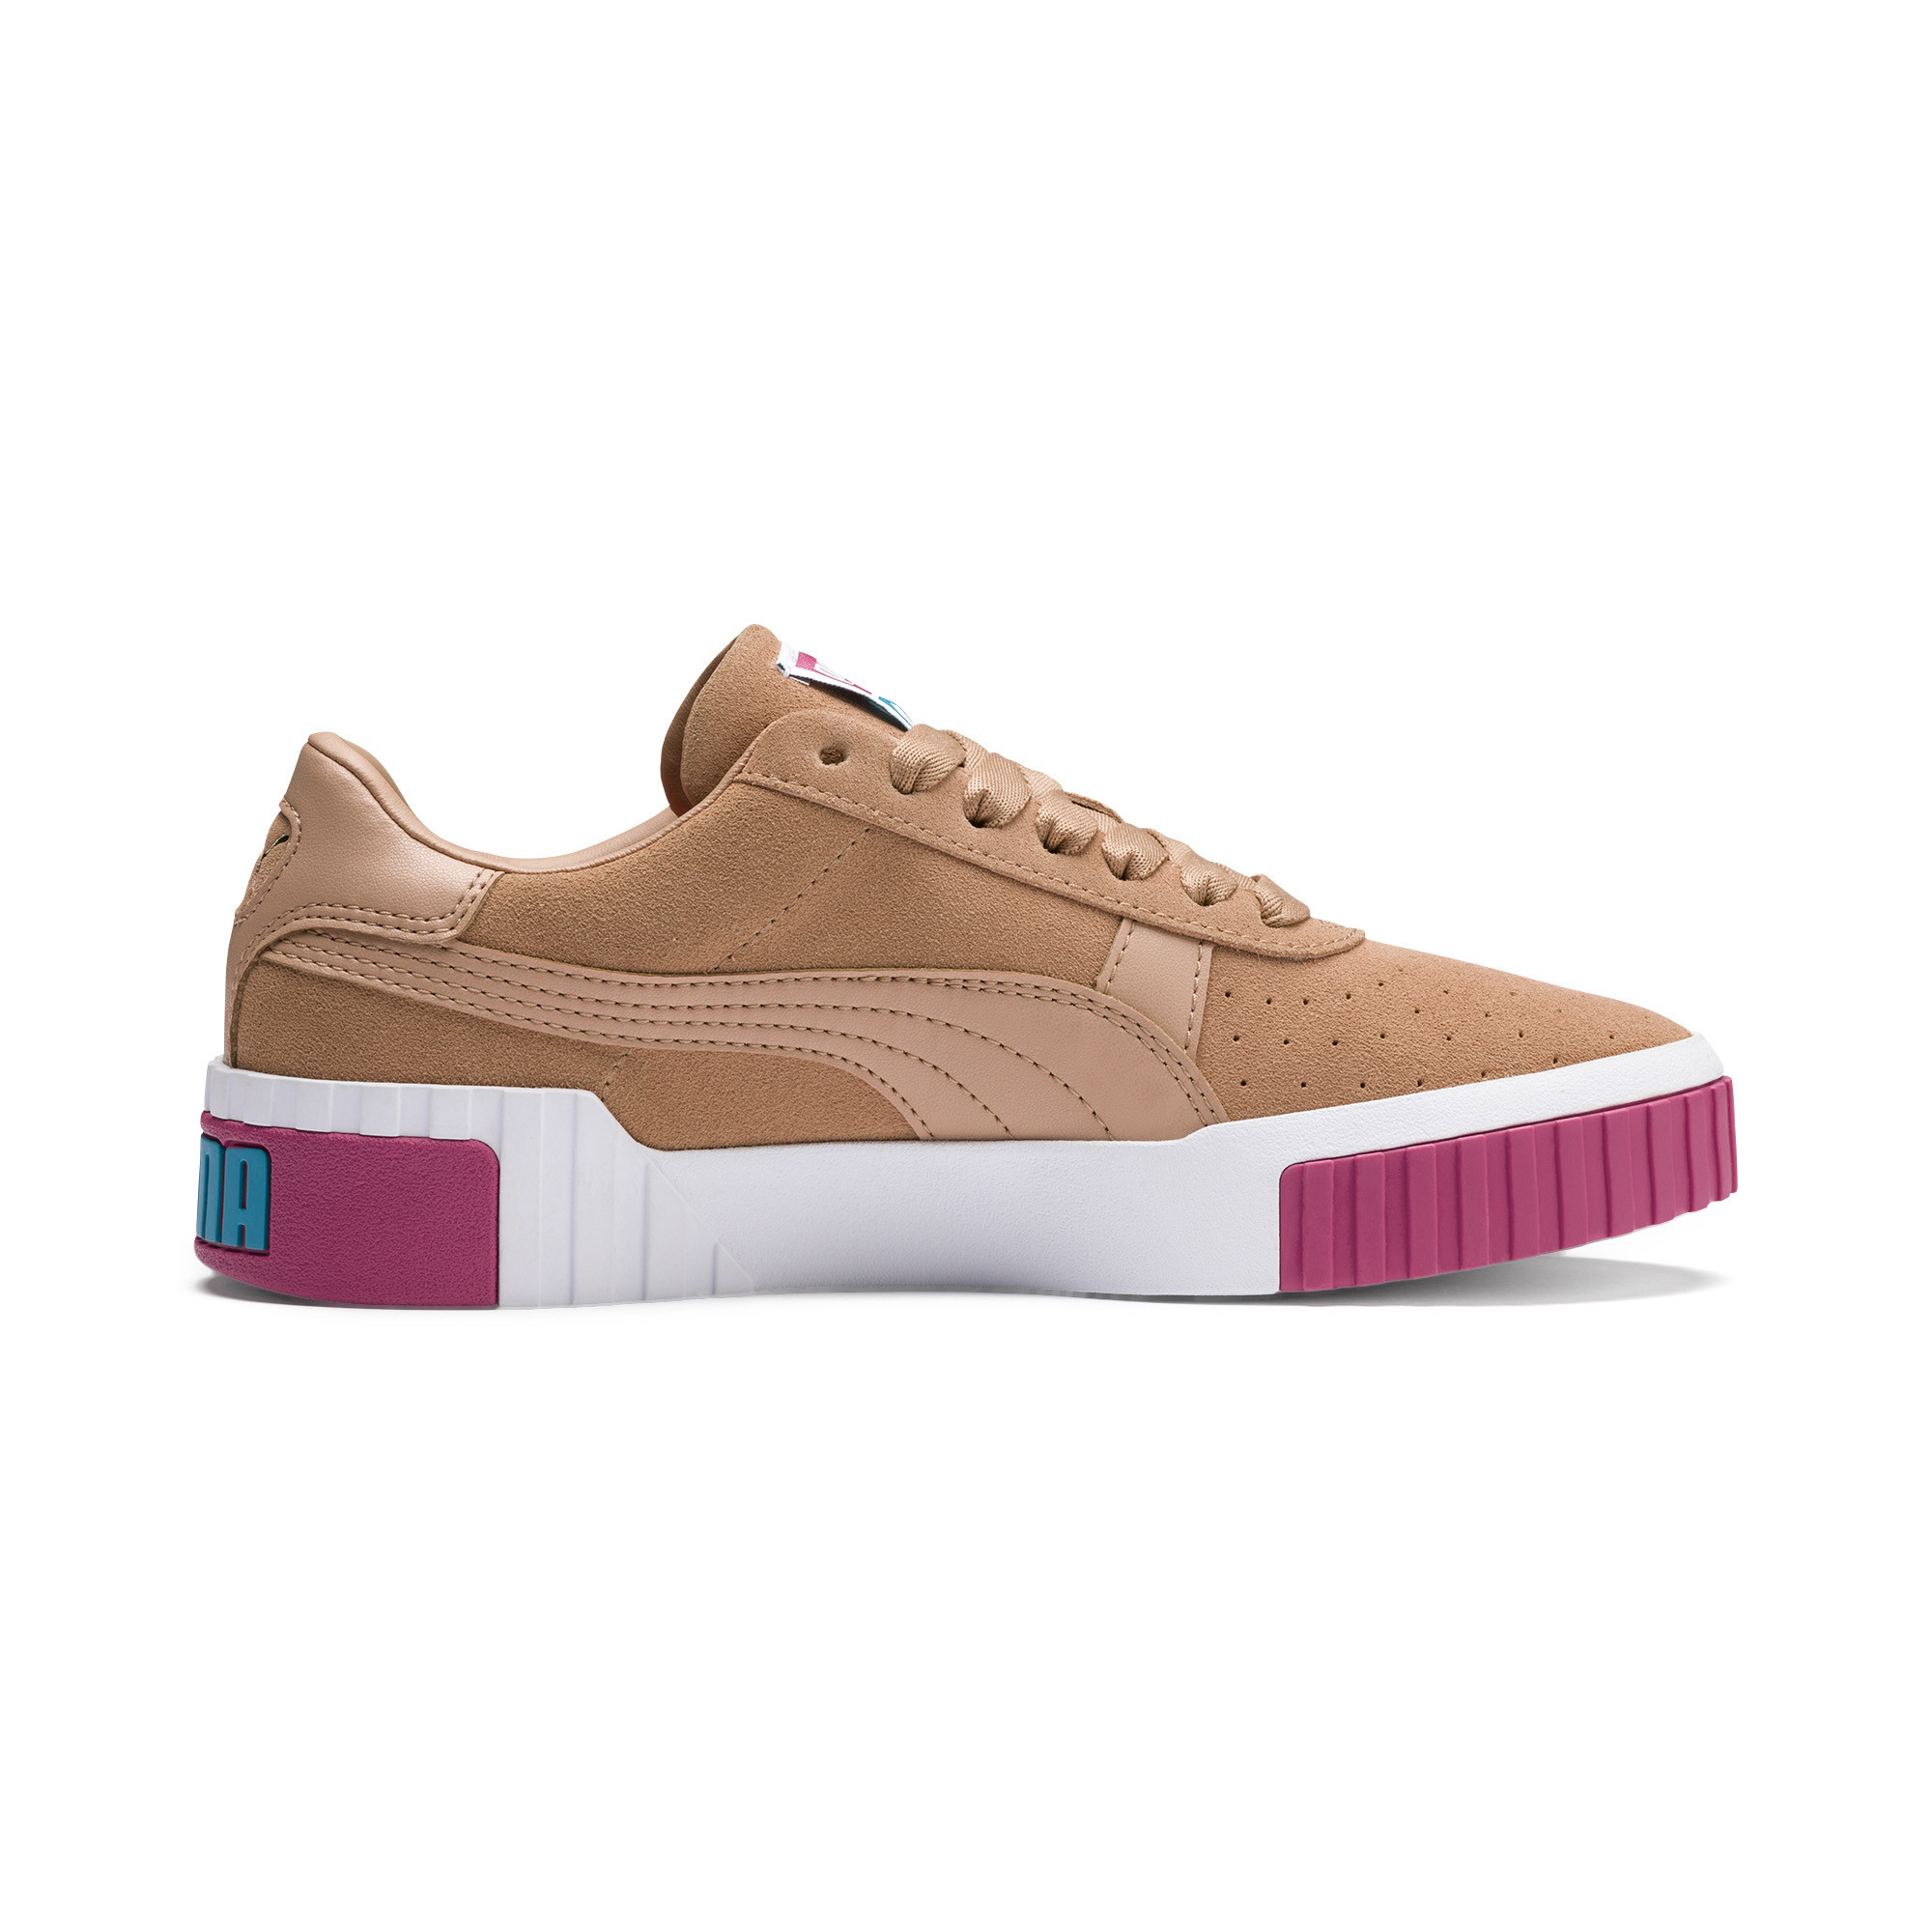 Image Puma Cali Suede Women's Sneakers #6